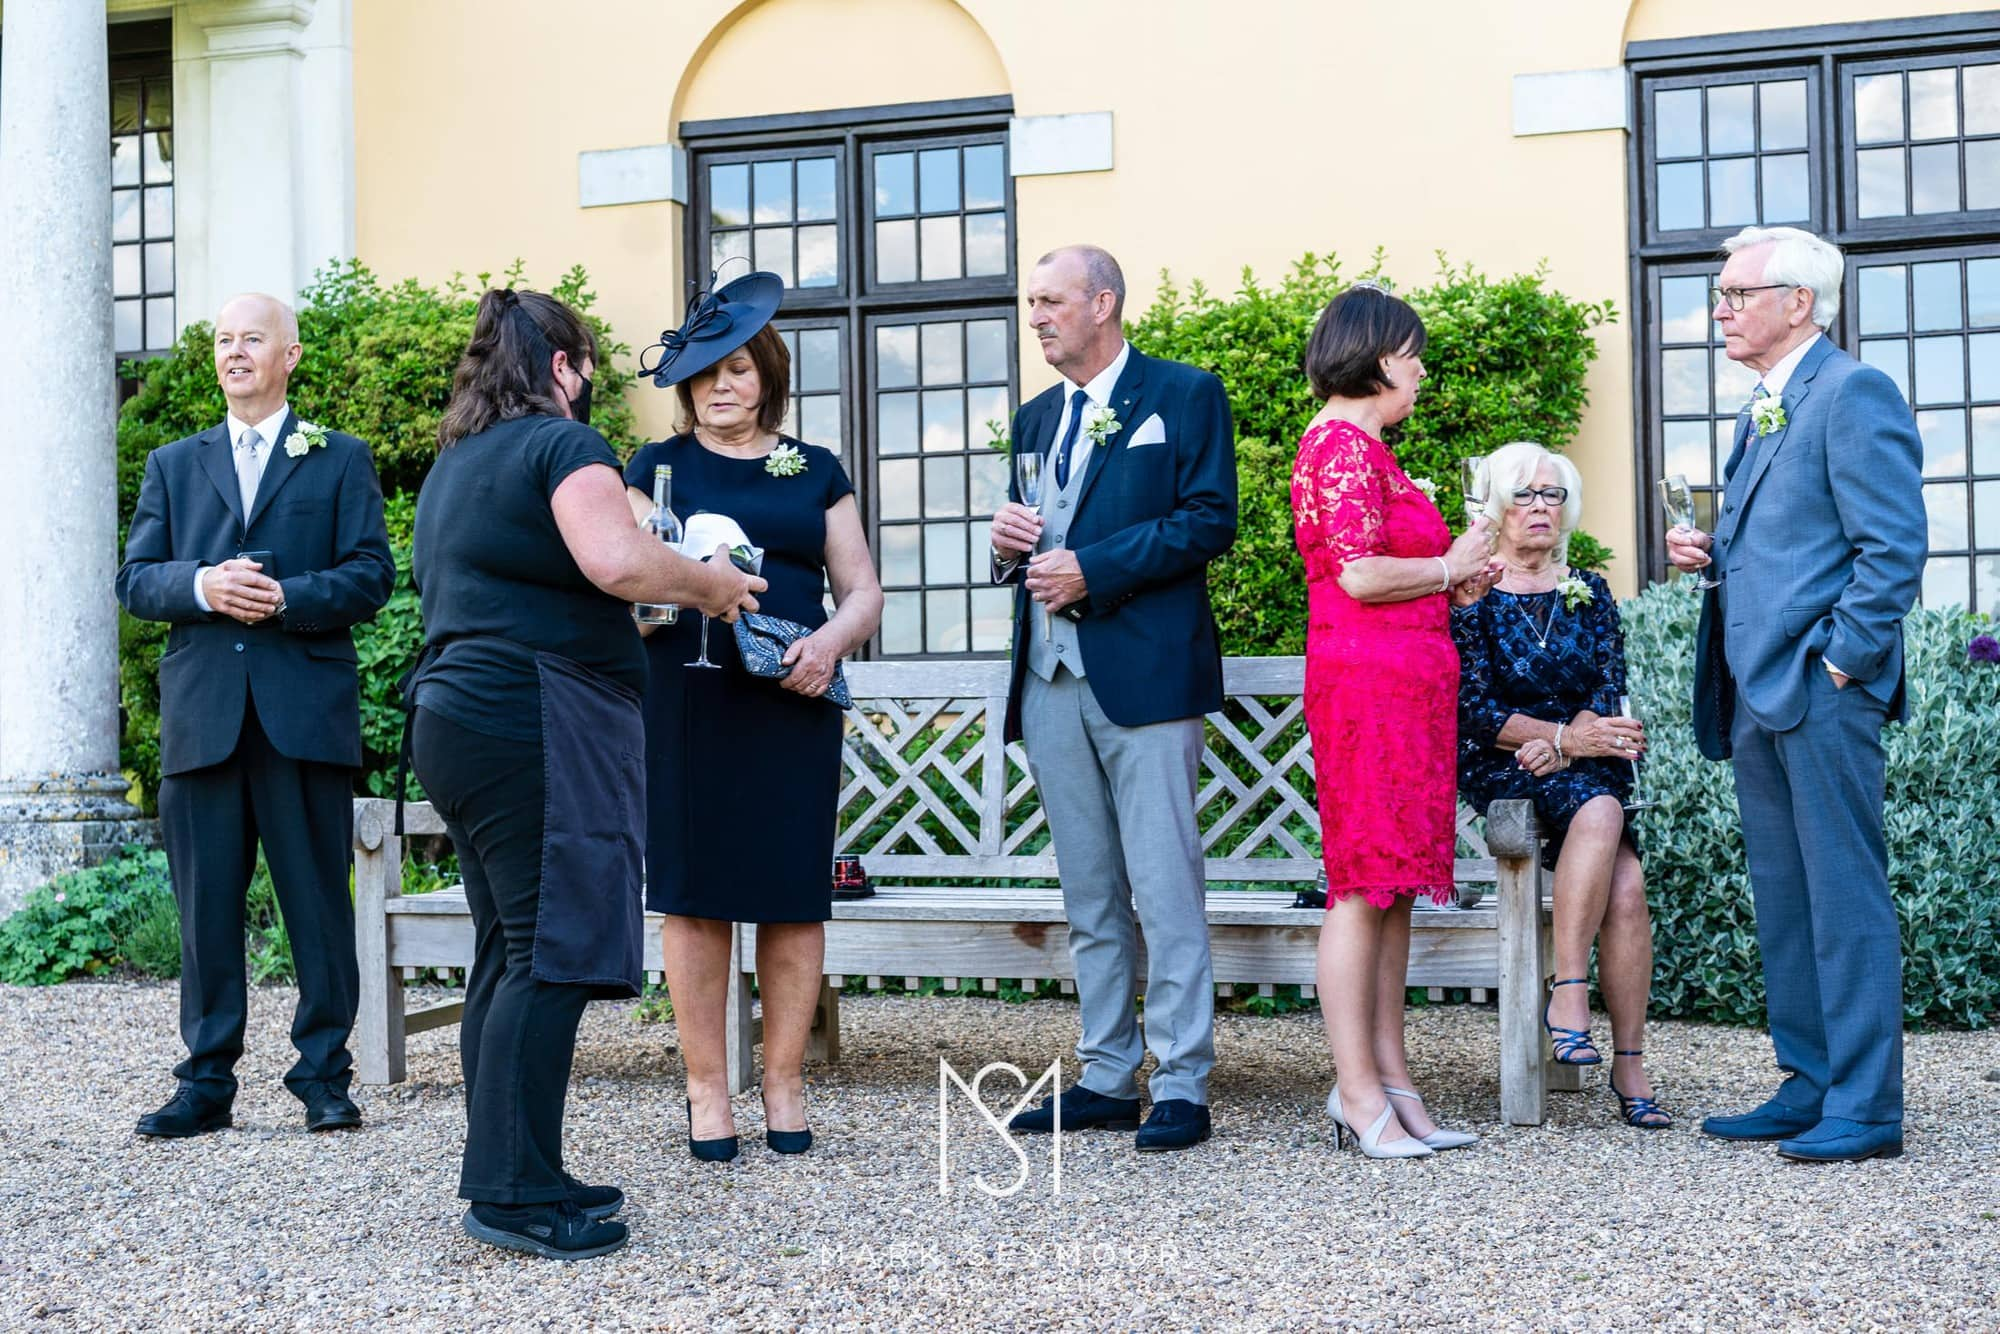 Hampden House Wedding Photography - Hannah and Lee's wedding. 10